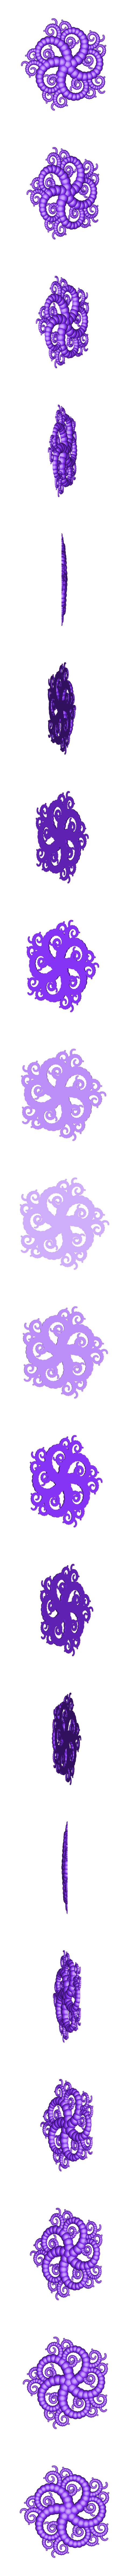 5_1_tentacles.stl Download free STL file Tentacle generator • 3D print object, ferjerez3d